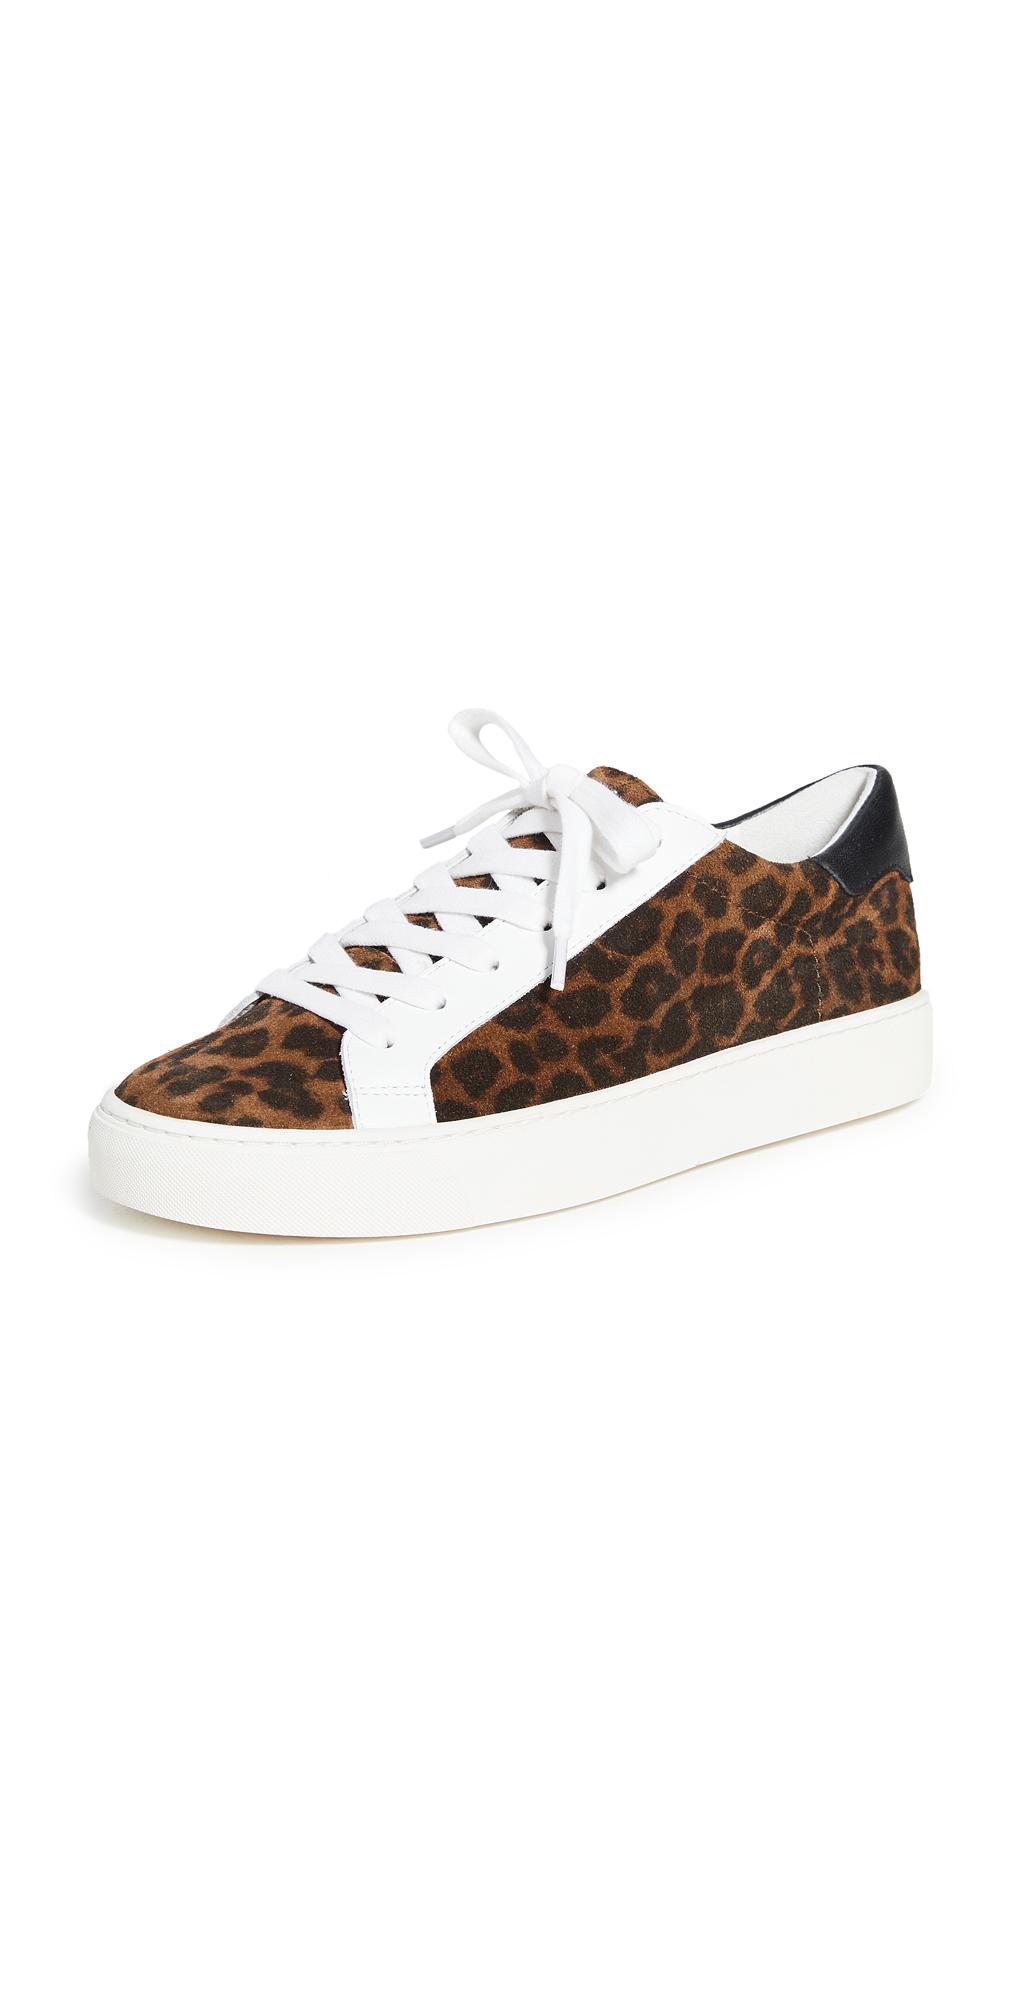 Veronica Beard Bibi Sneakers